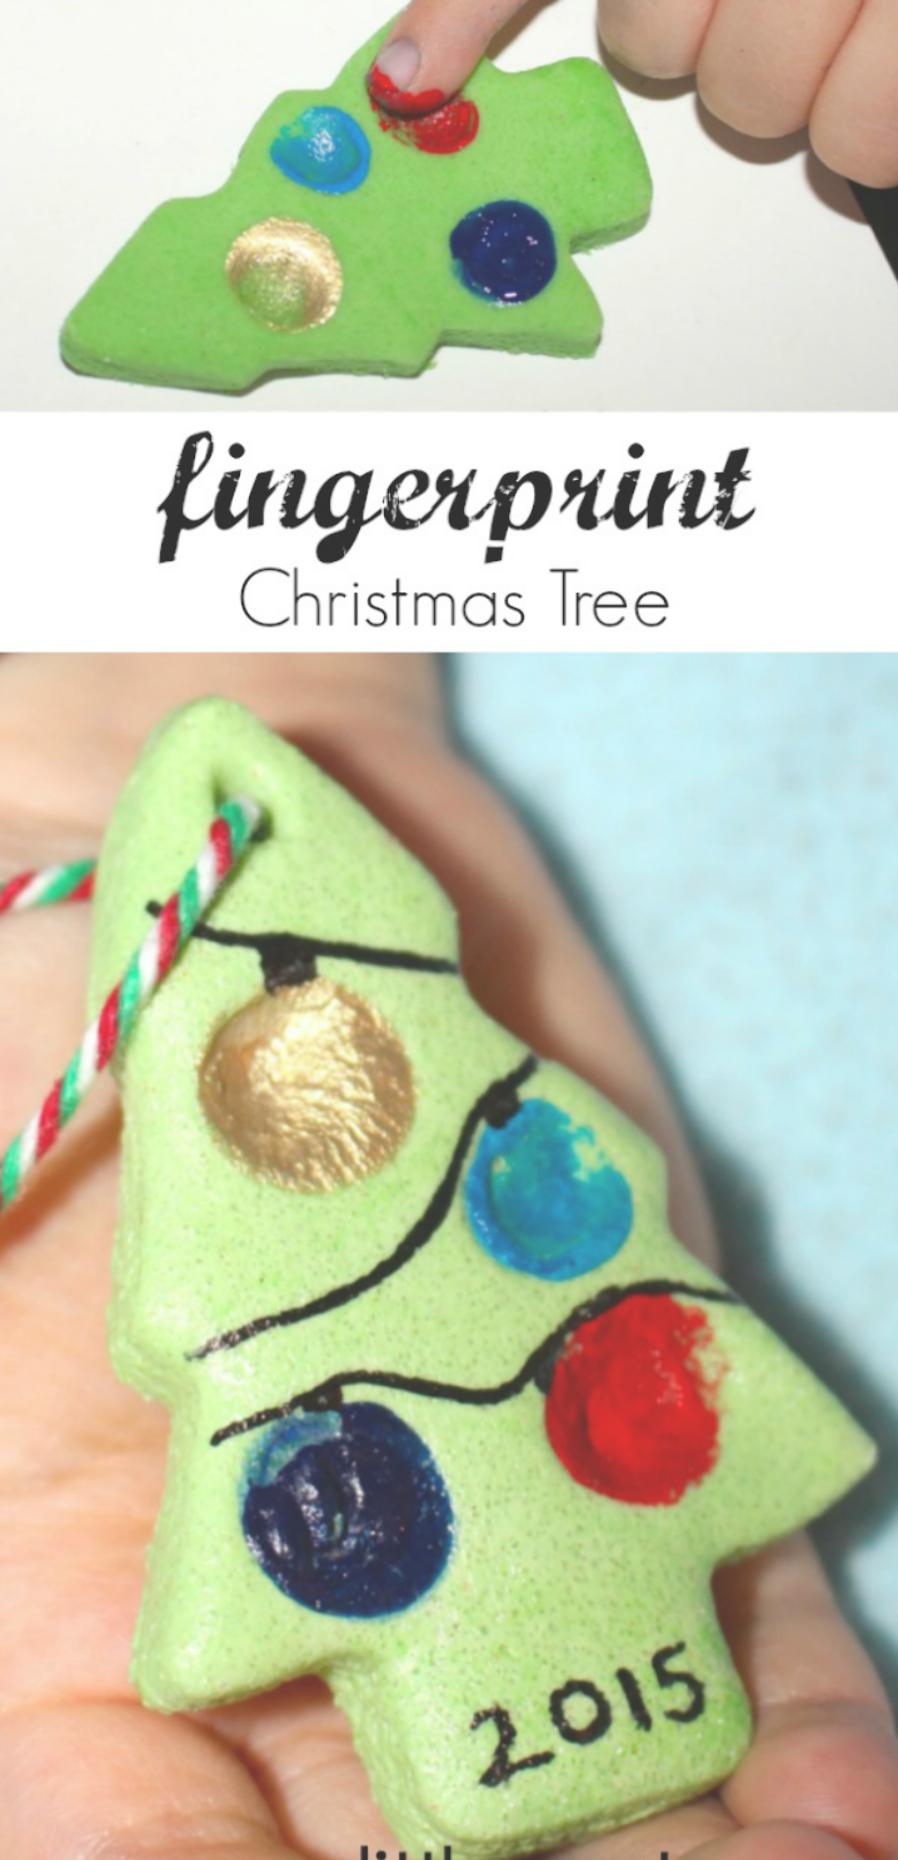 Fingerprint christmas tree crafts for kids. Coloured salt dough ornament recipe. Easy salt dough crafts. Personalized Christmas ornament for toddlers and preschoolers to make. #saltdoughornaments